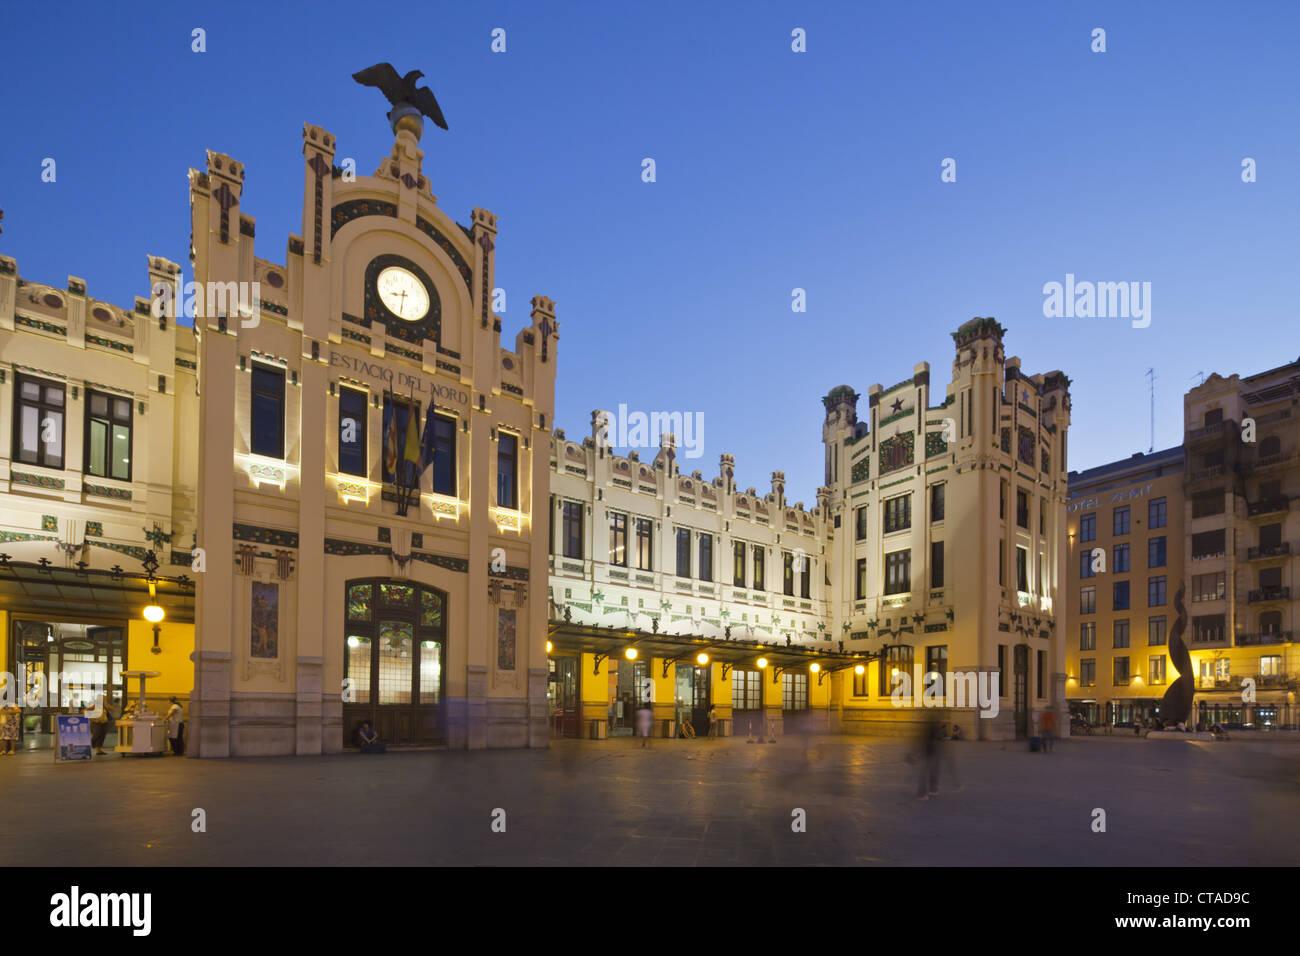 Railway Station Estacion del Nord in the evening, Valencia, Spain, Europe - Stock Image